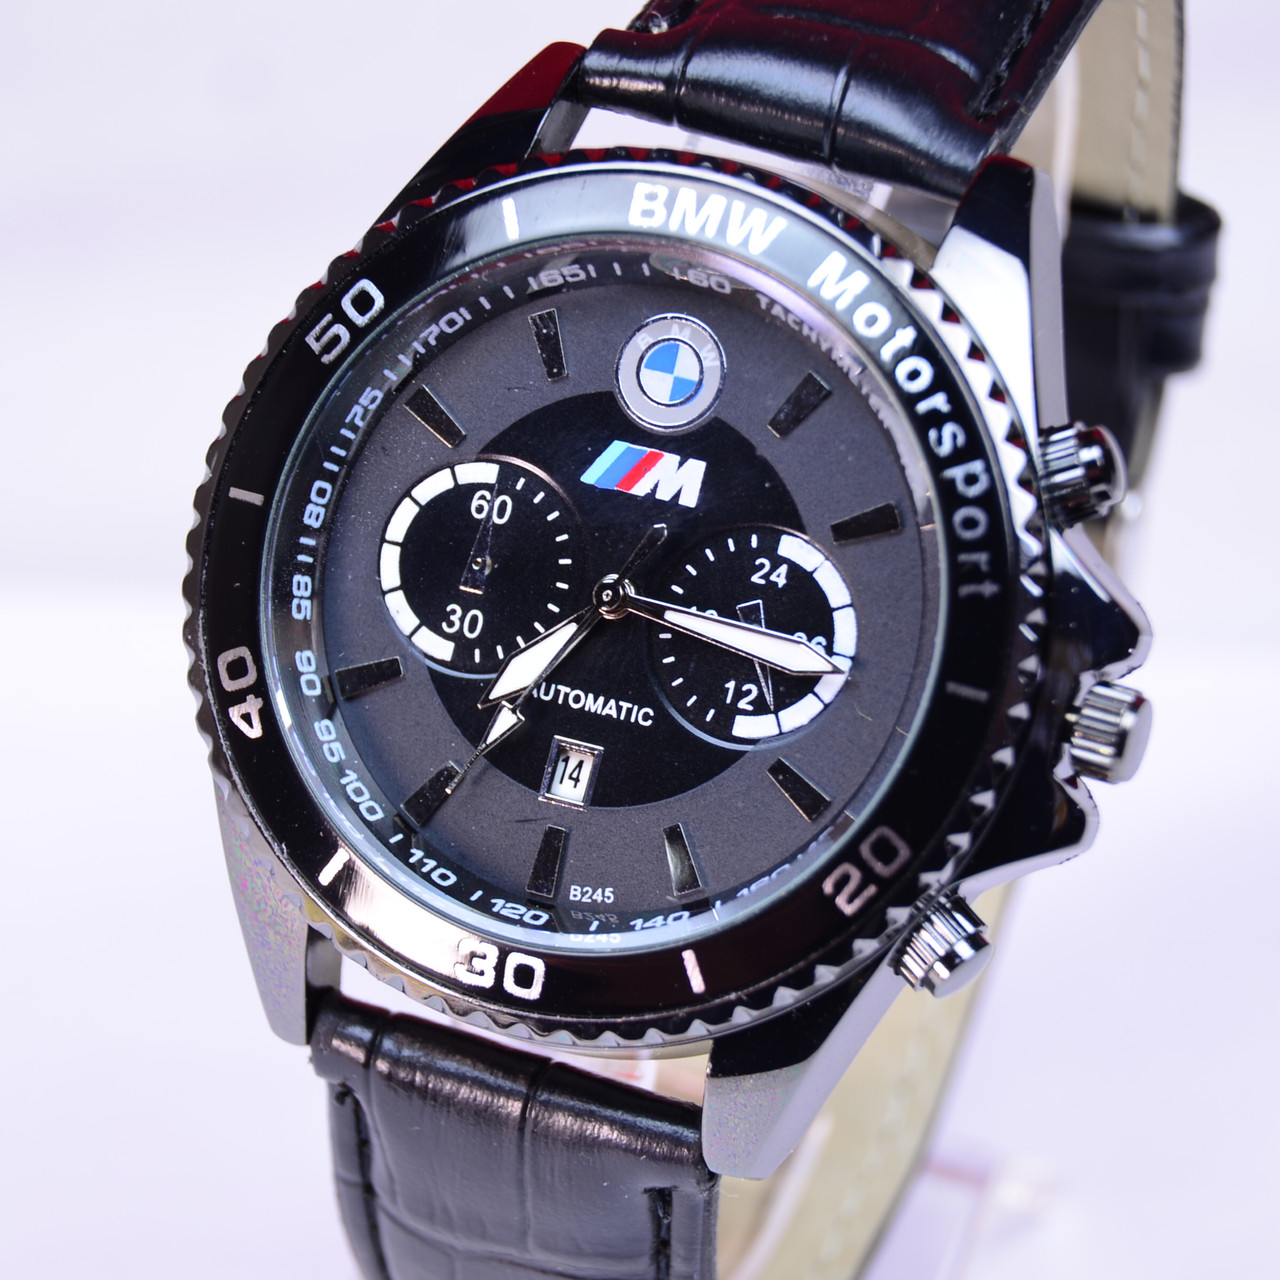 dc966be8 Мужские наручные часы BMW (B243) кварц календарь: продажа, цена в ...